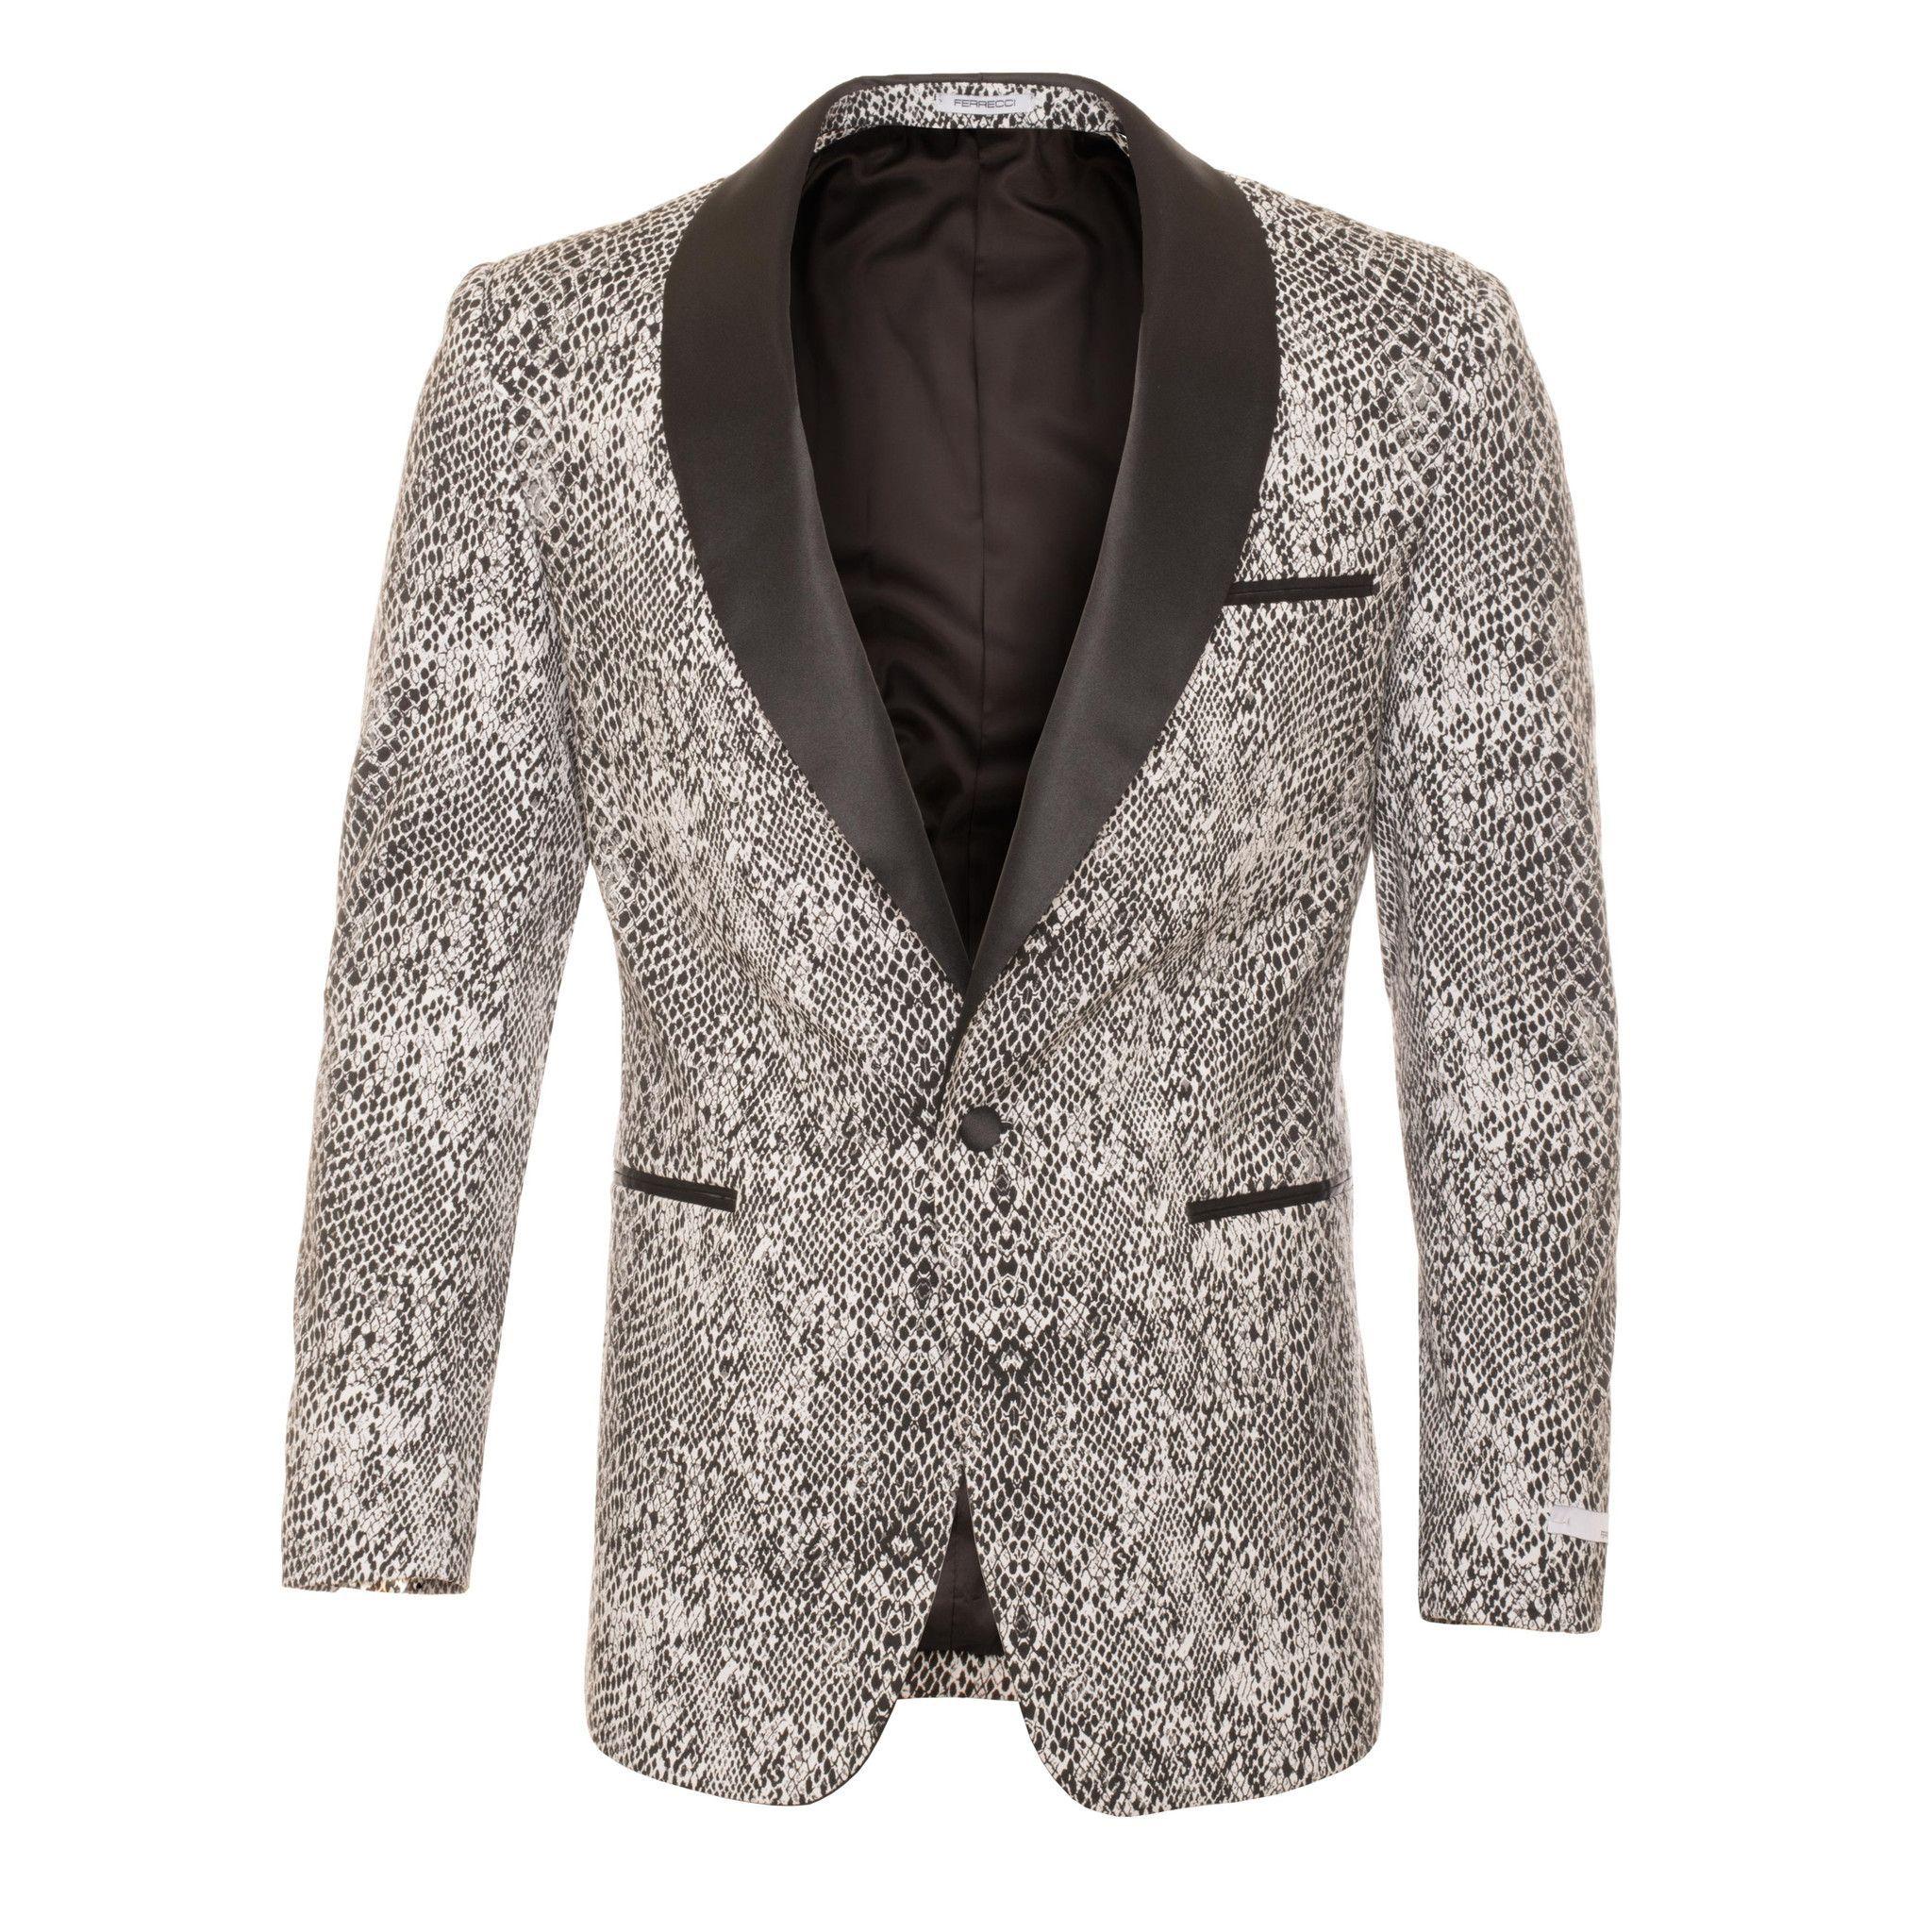 1d63cfa706a Ash Black and White Snake Skin Tuxedo Blazer in 2019